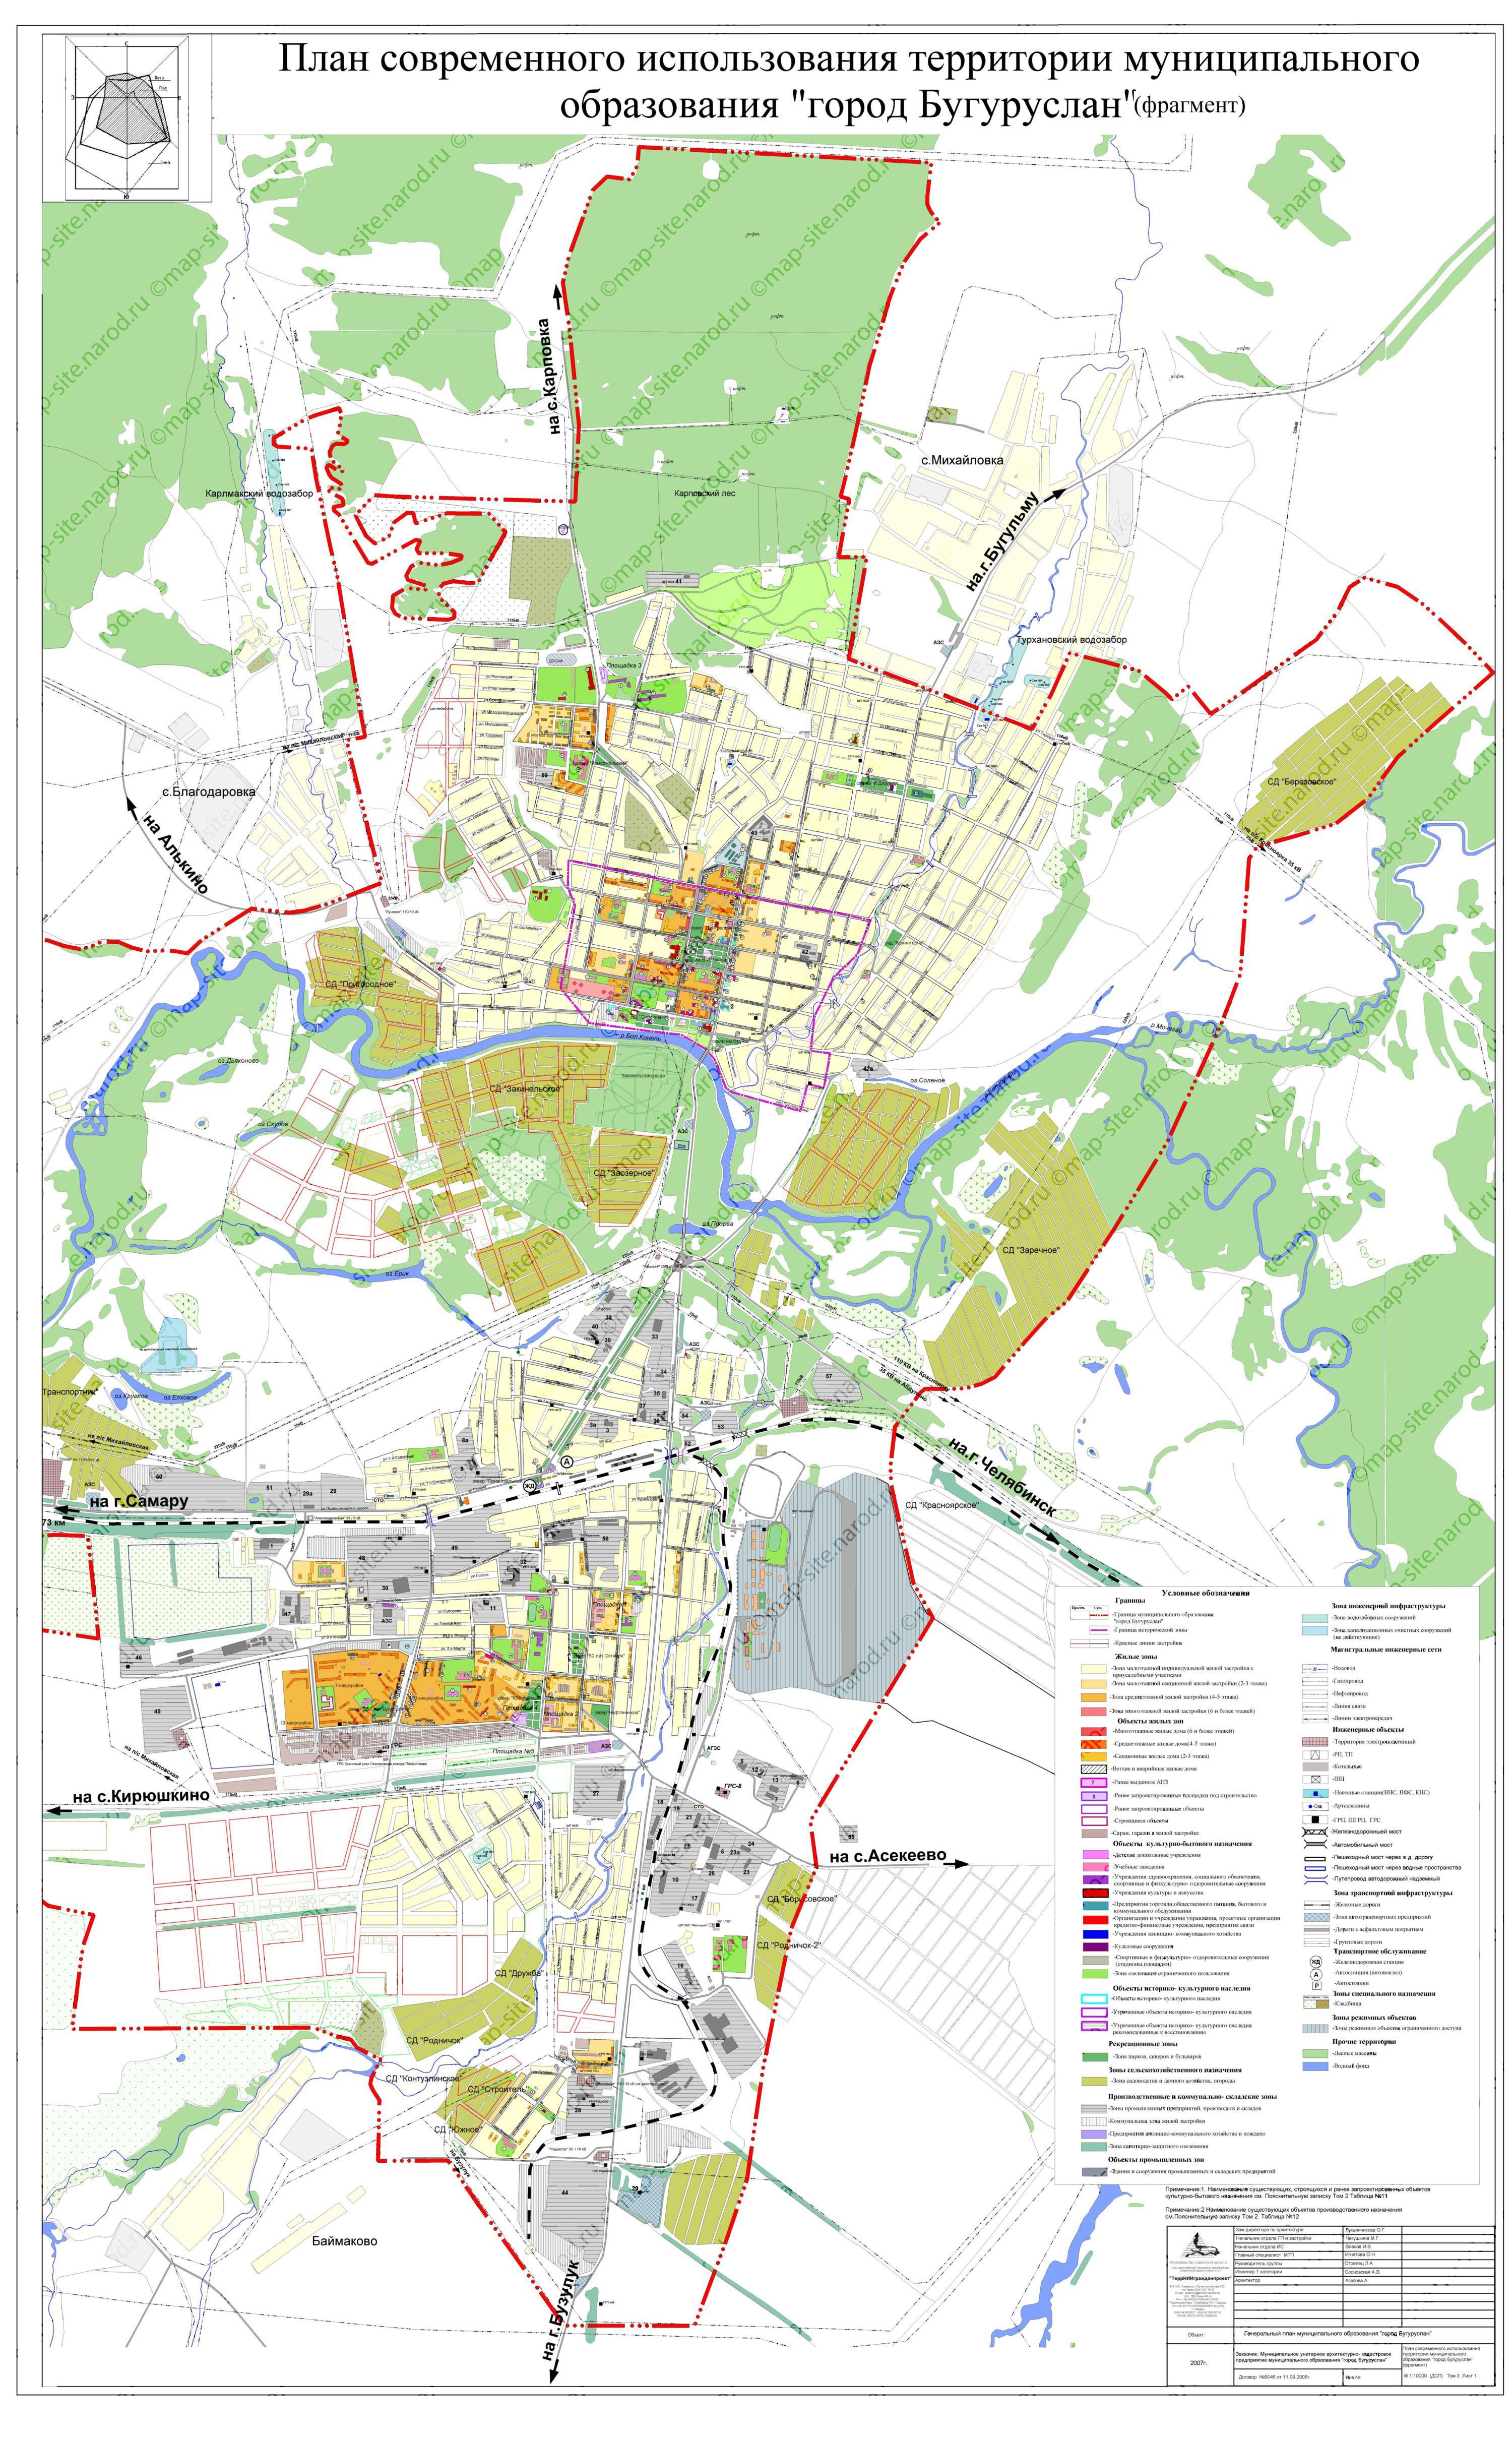 Бугуруслан - Самара расстояние между городами на